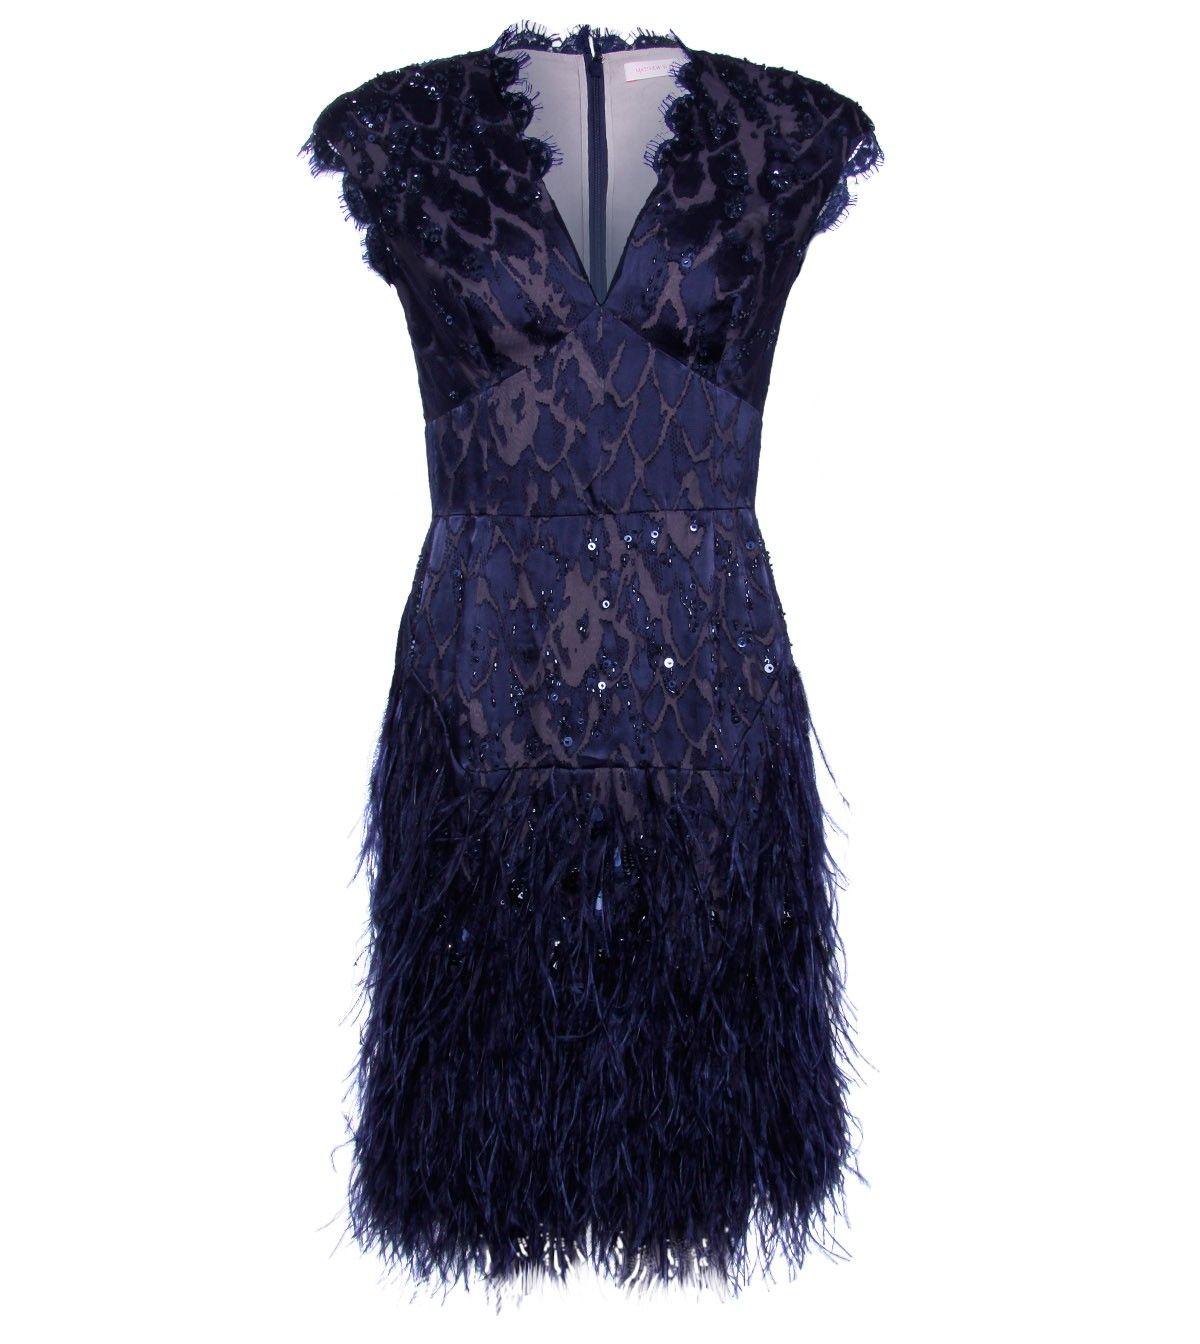 DRESSES - Short dresses Matthew Williamson 4yZanW